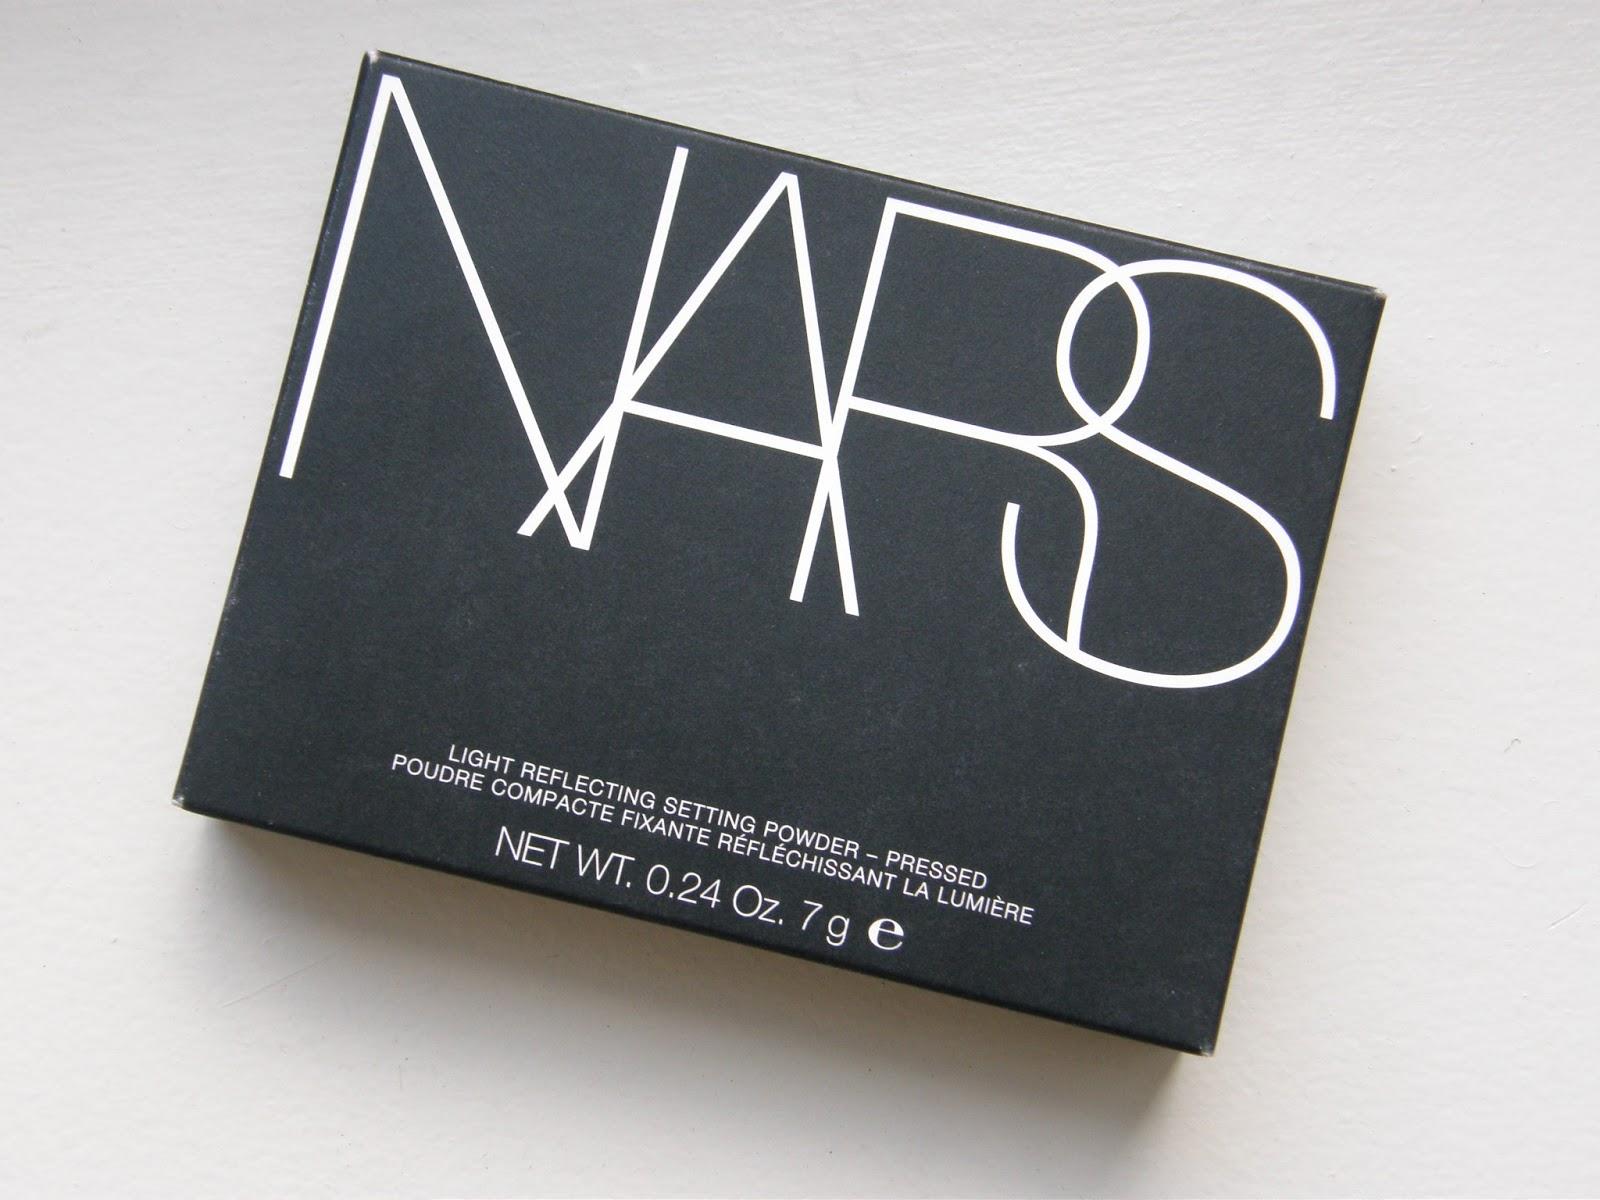 thrift thick nars light reflecting setting powder. Black Bedroom Furniture Sets. Home Design Ideas